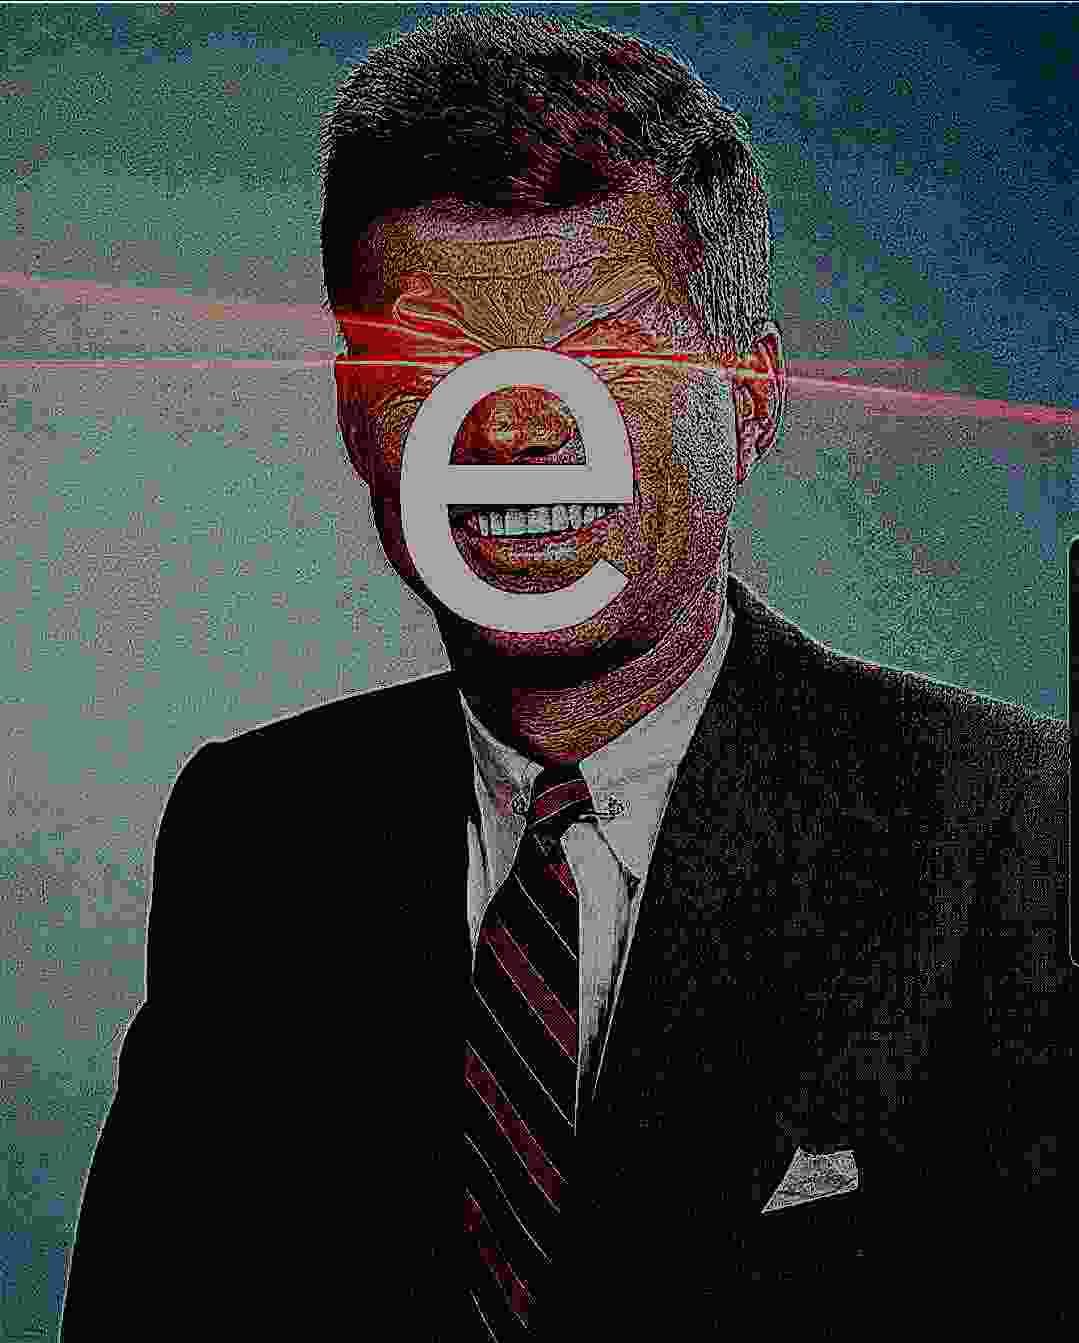 #7 - meme